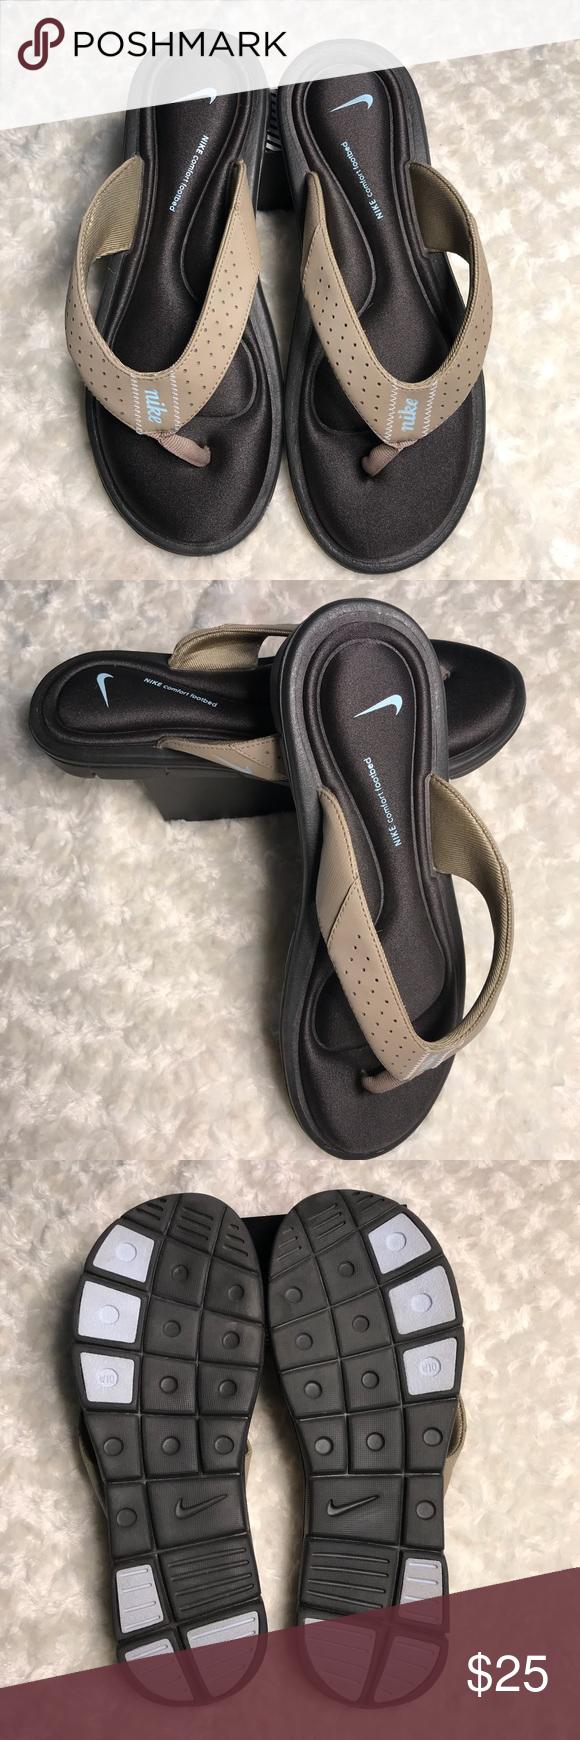 thong s p sandals footbed comforter womens beautiful design women nike comfort